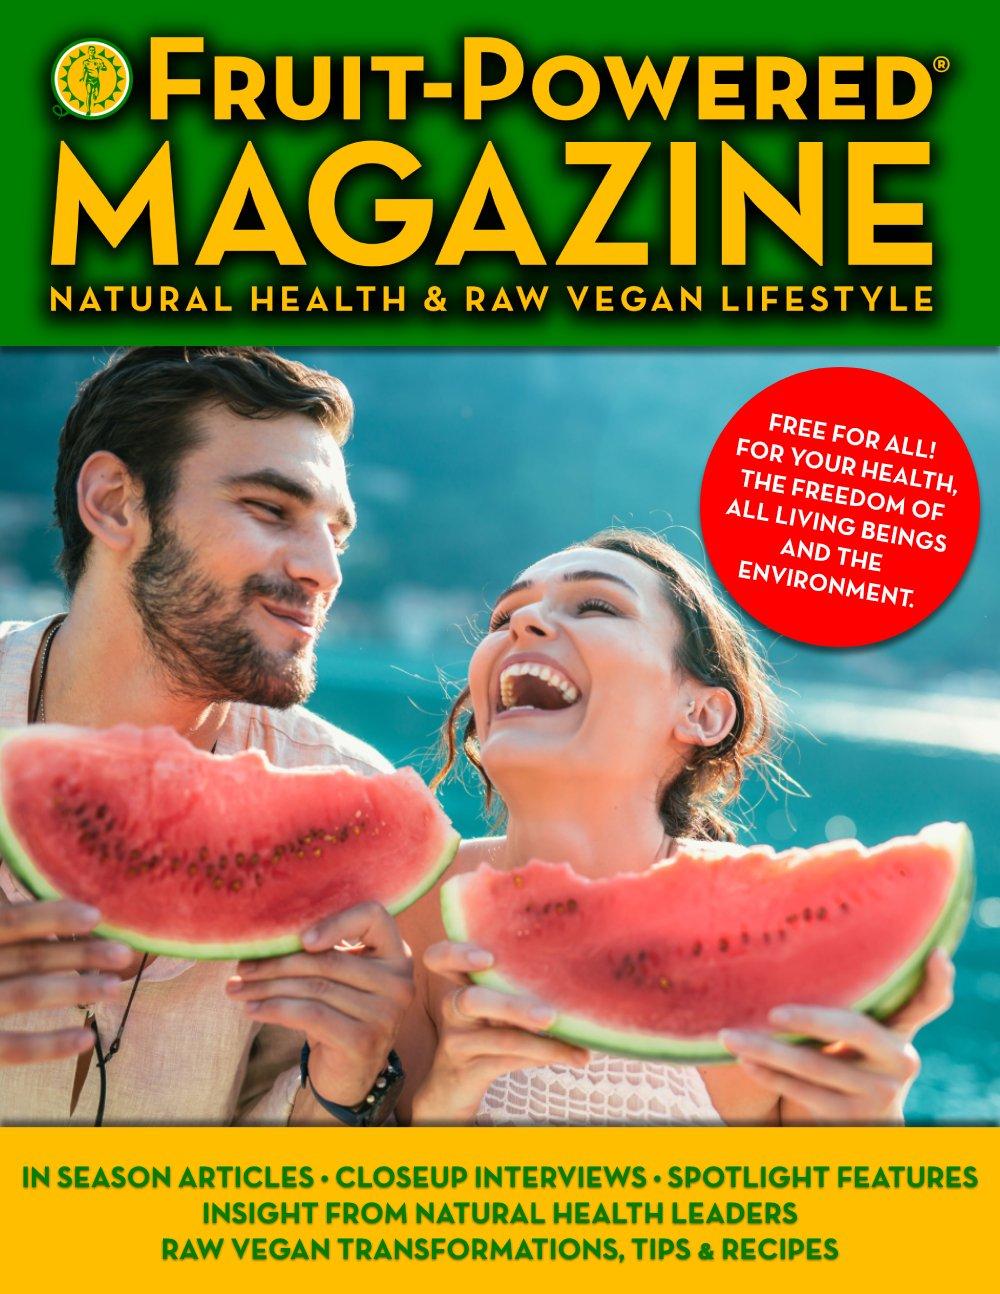 Fruit-Powered Magazine: Natural Health Magazine and Raw Vegan Magazine open-issue cover